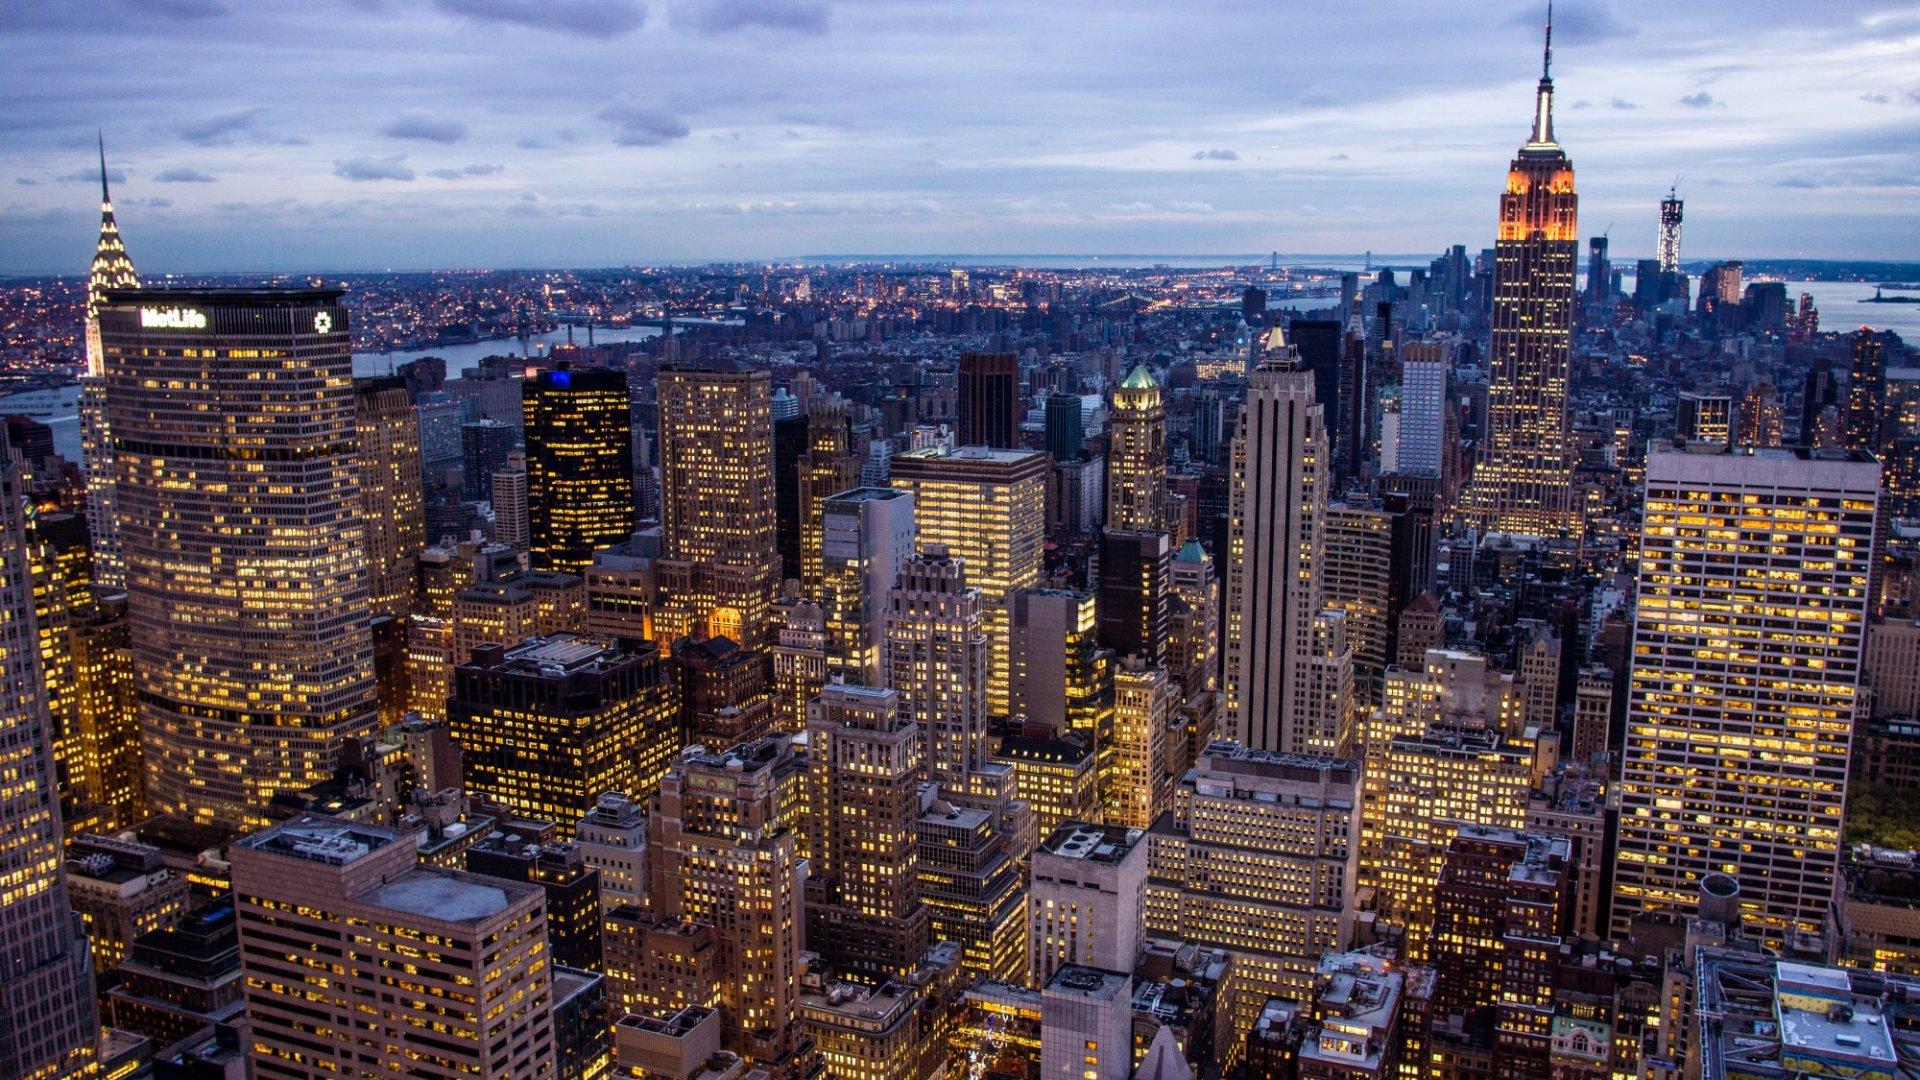 New York Gains Ground as Startup Hotspot